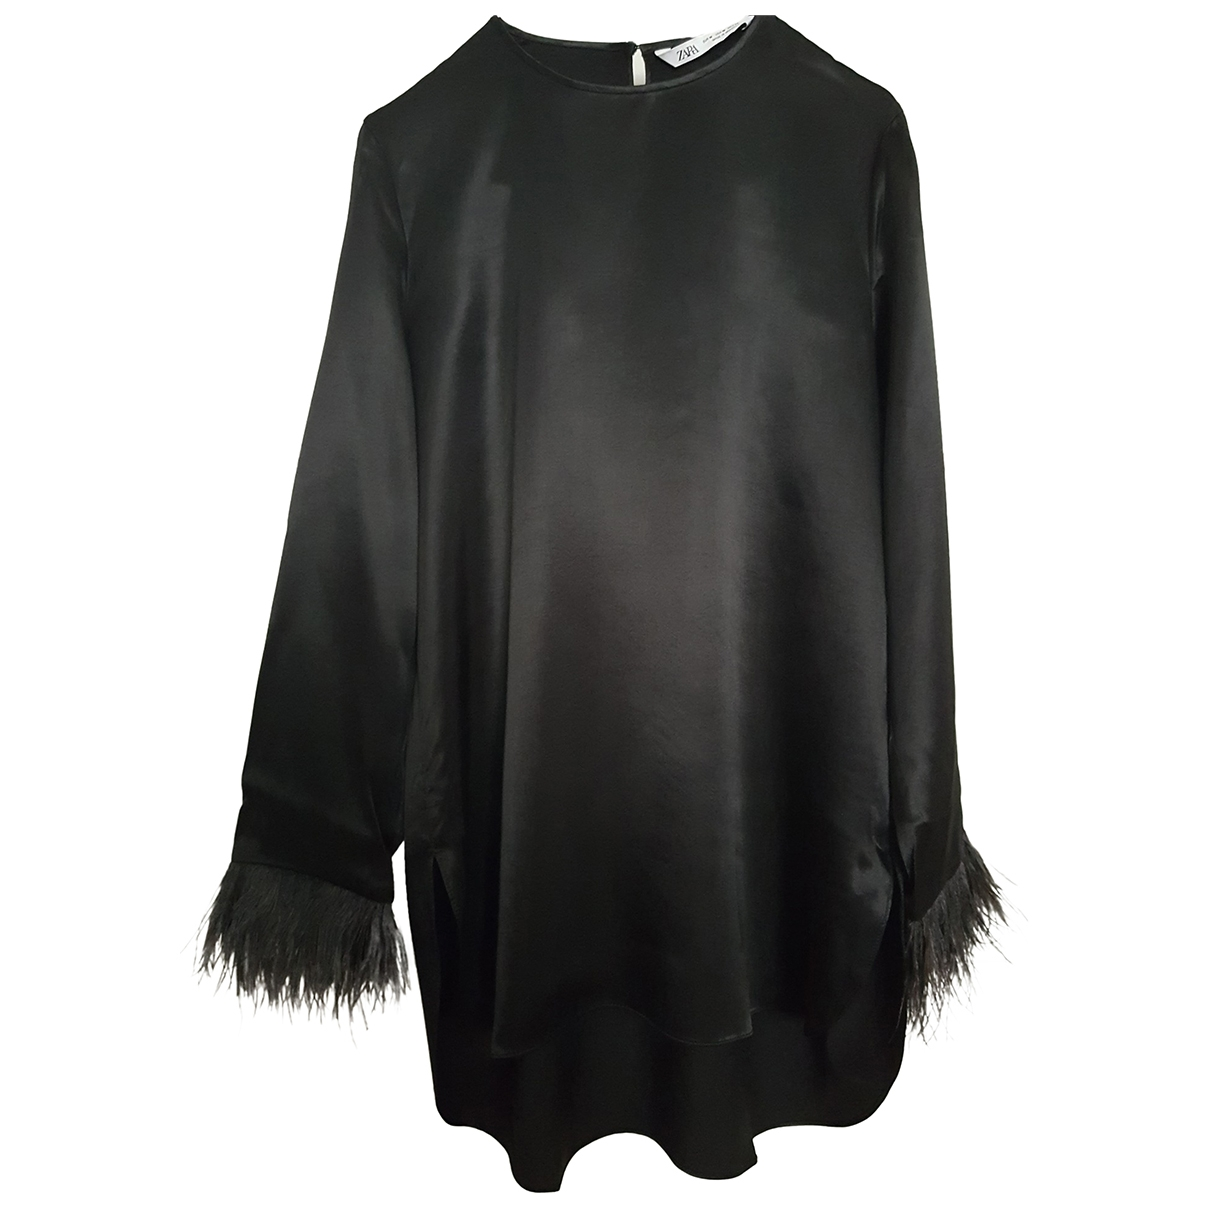 Zara \N Black dress for Women M International